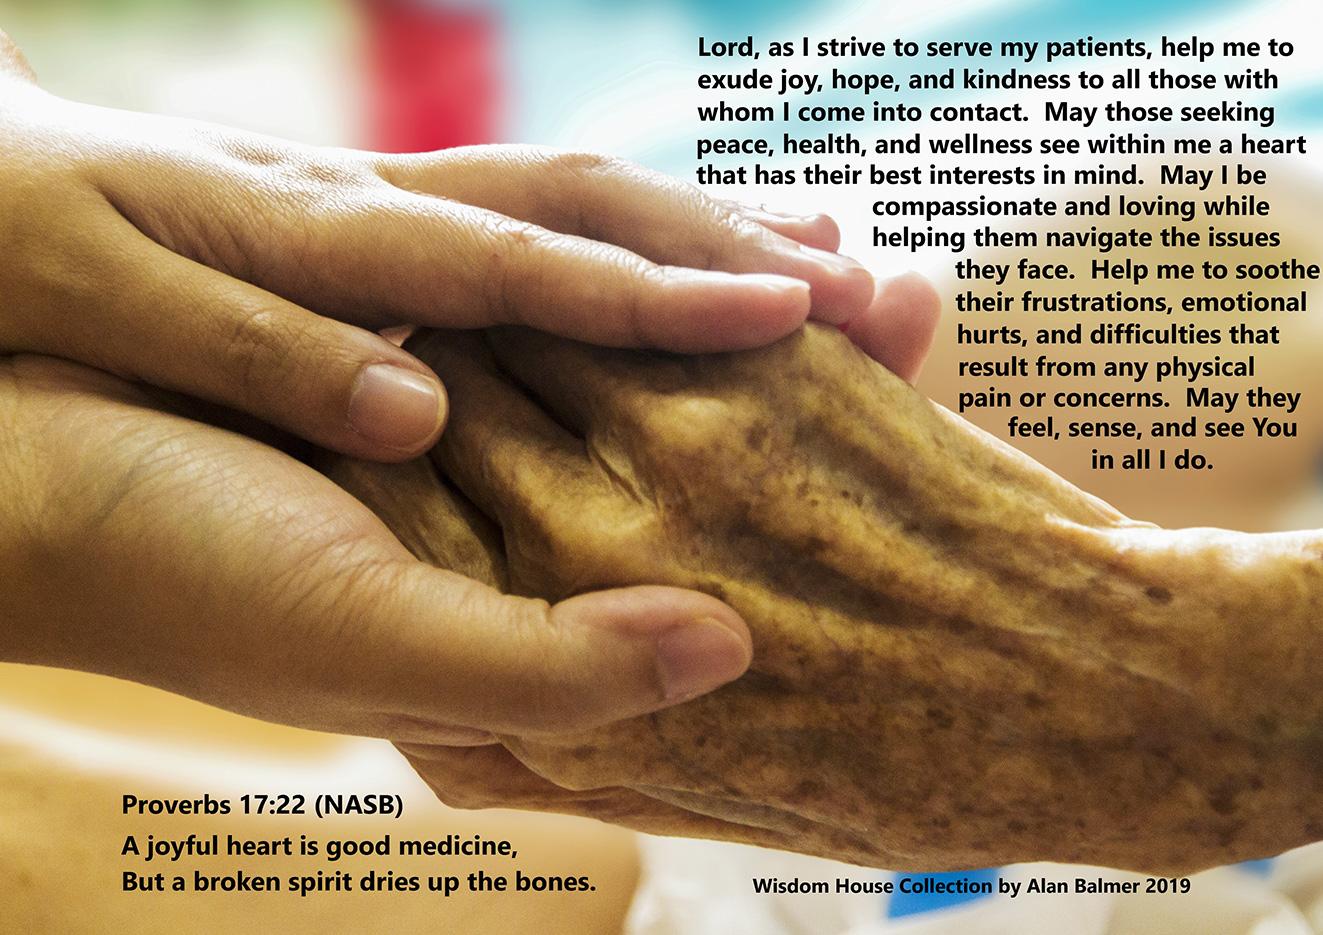 The Health Care Provider Prayer Based on Psalm 17:22 -